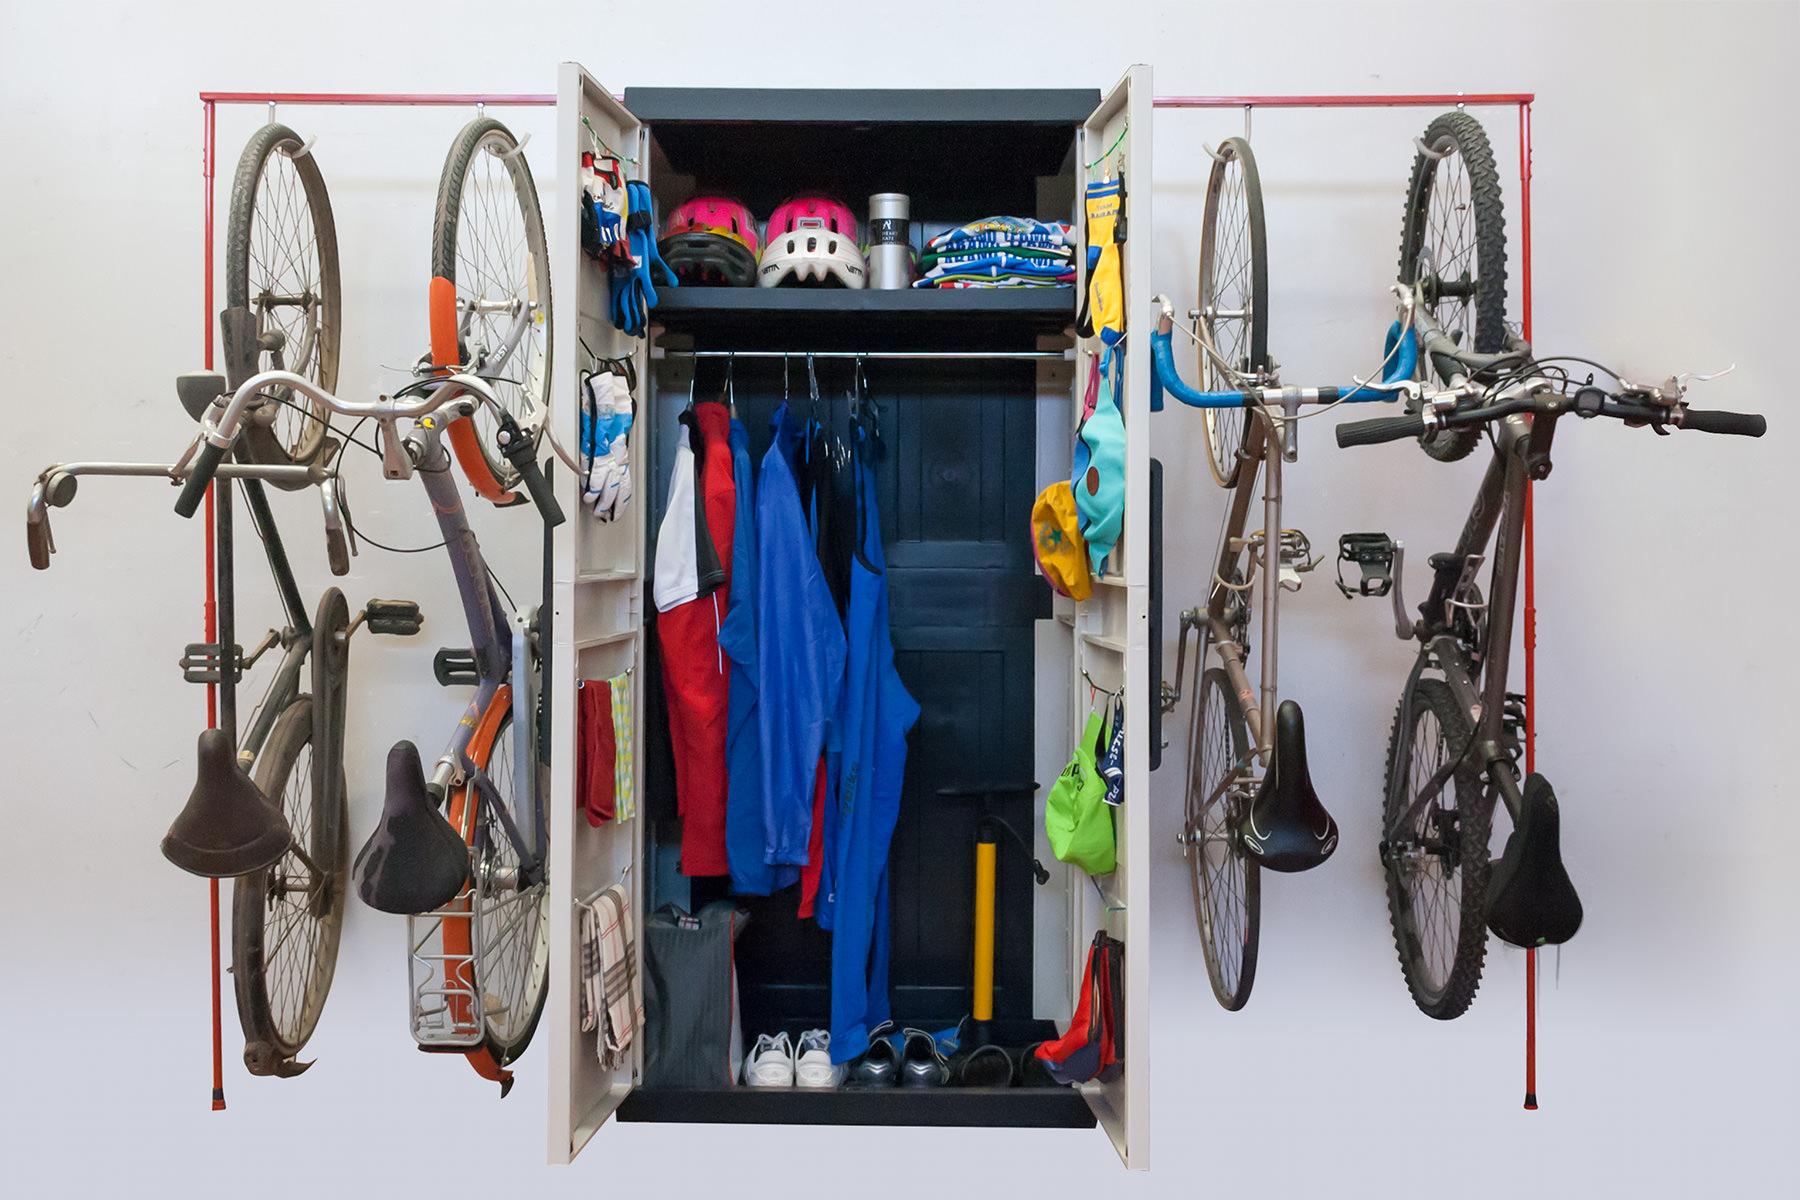 [Immagine: Bike-fronte-aperto.jpg]